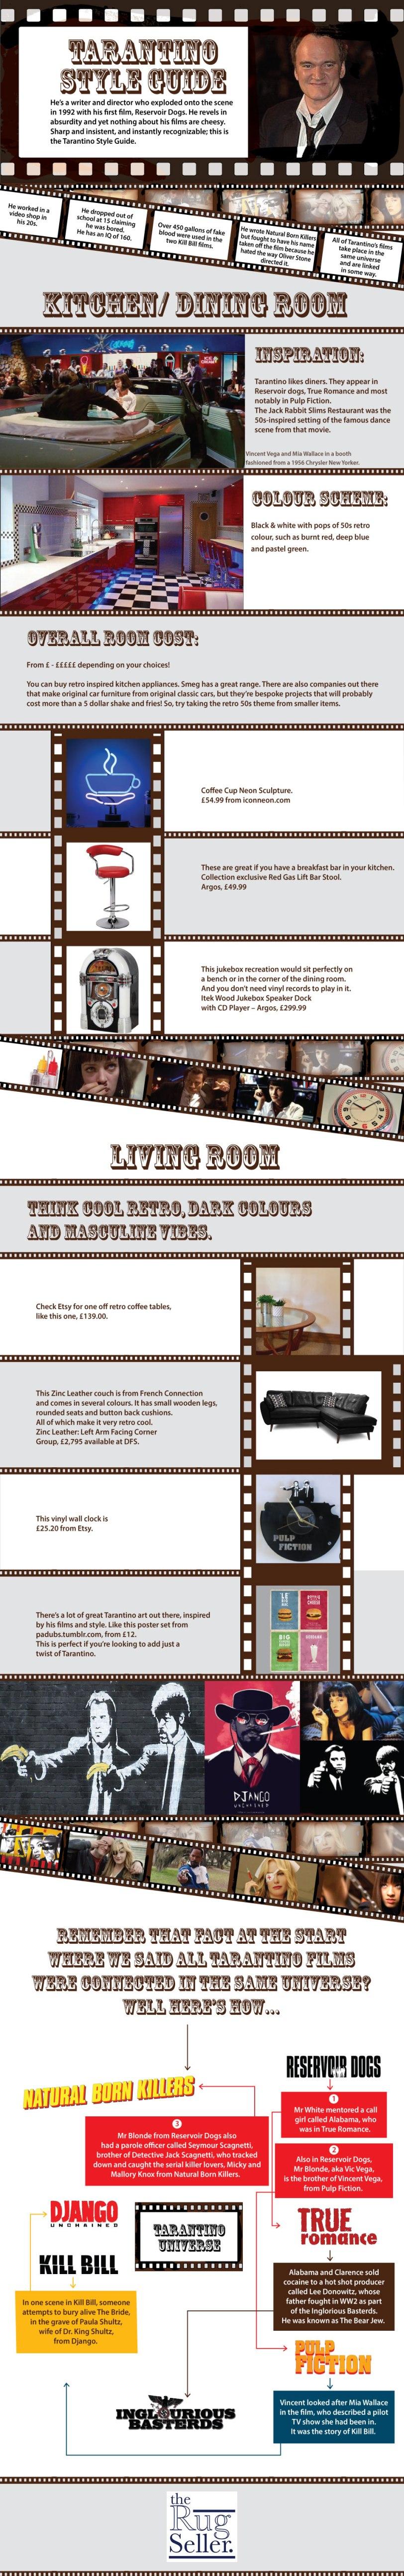 The Tarantino Style Guide